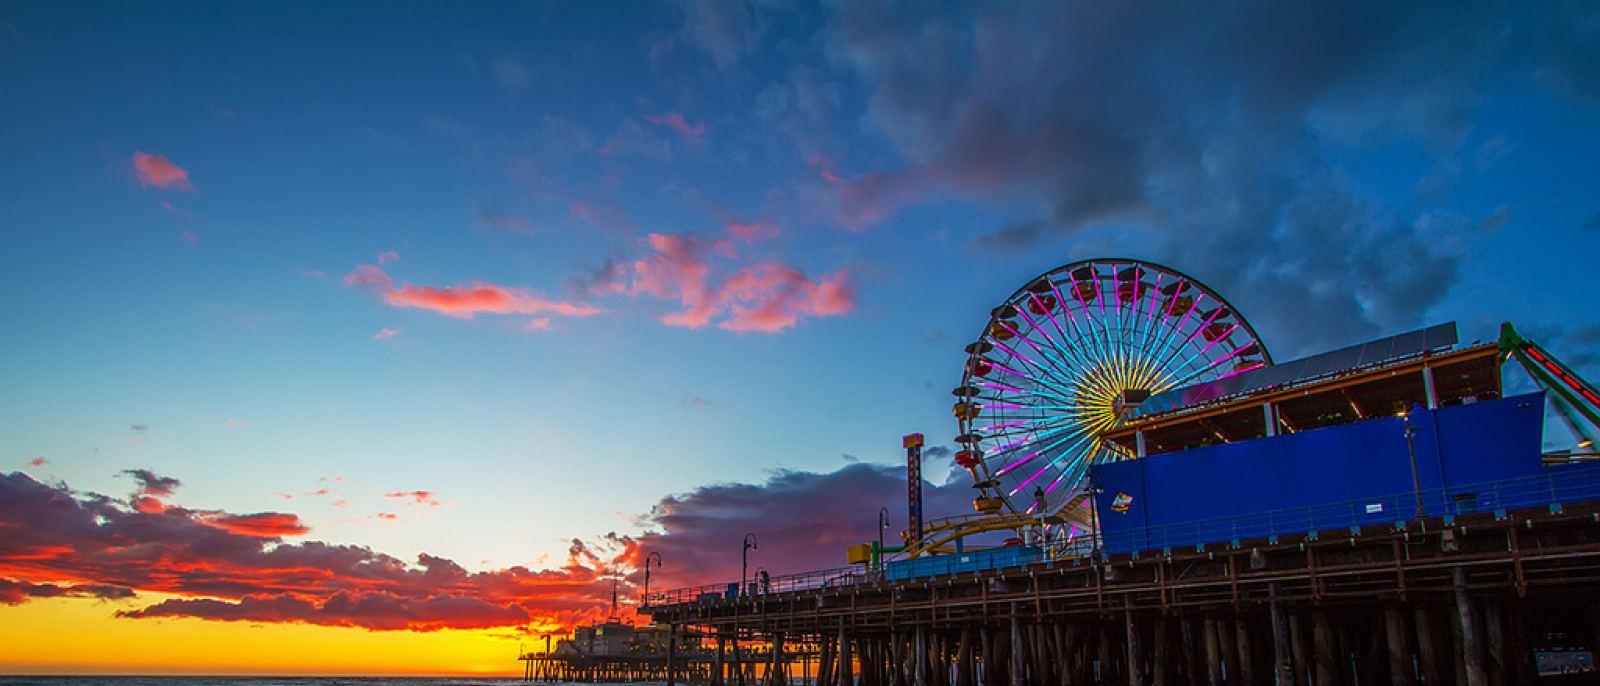 Santa Monica Pier | Photo courtesy of Shabdro Photo, Flickr